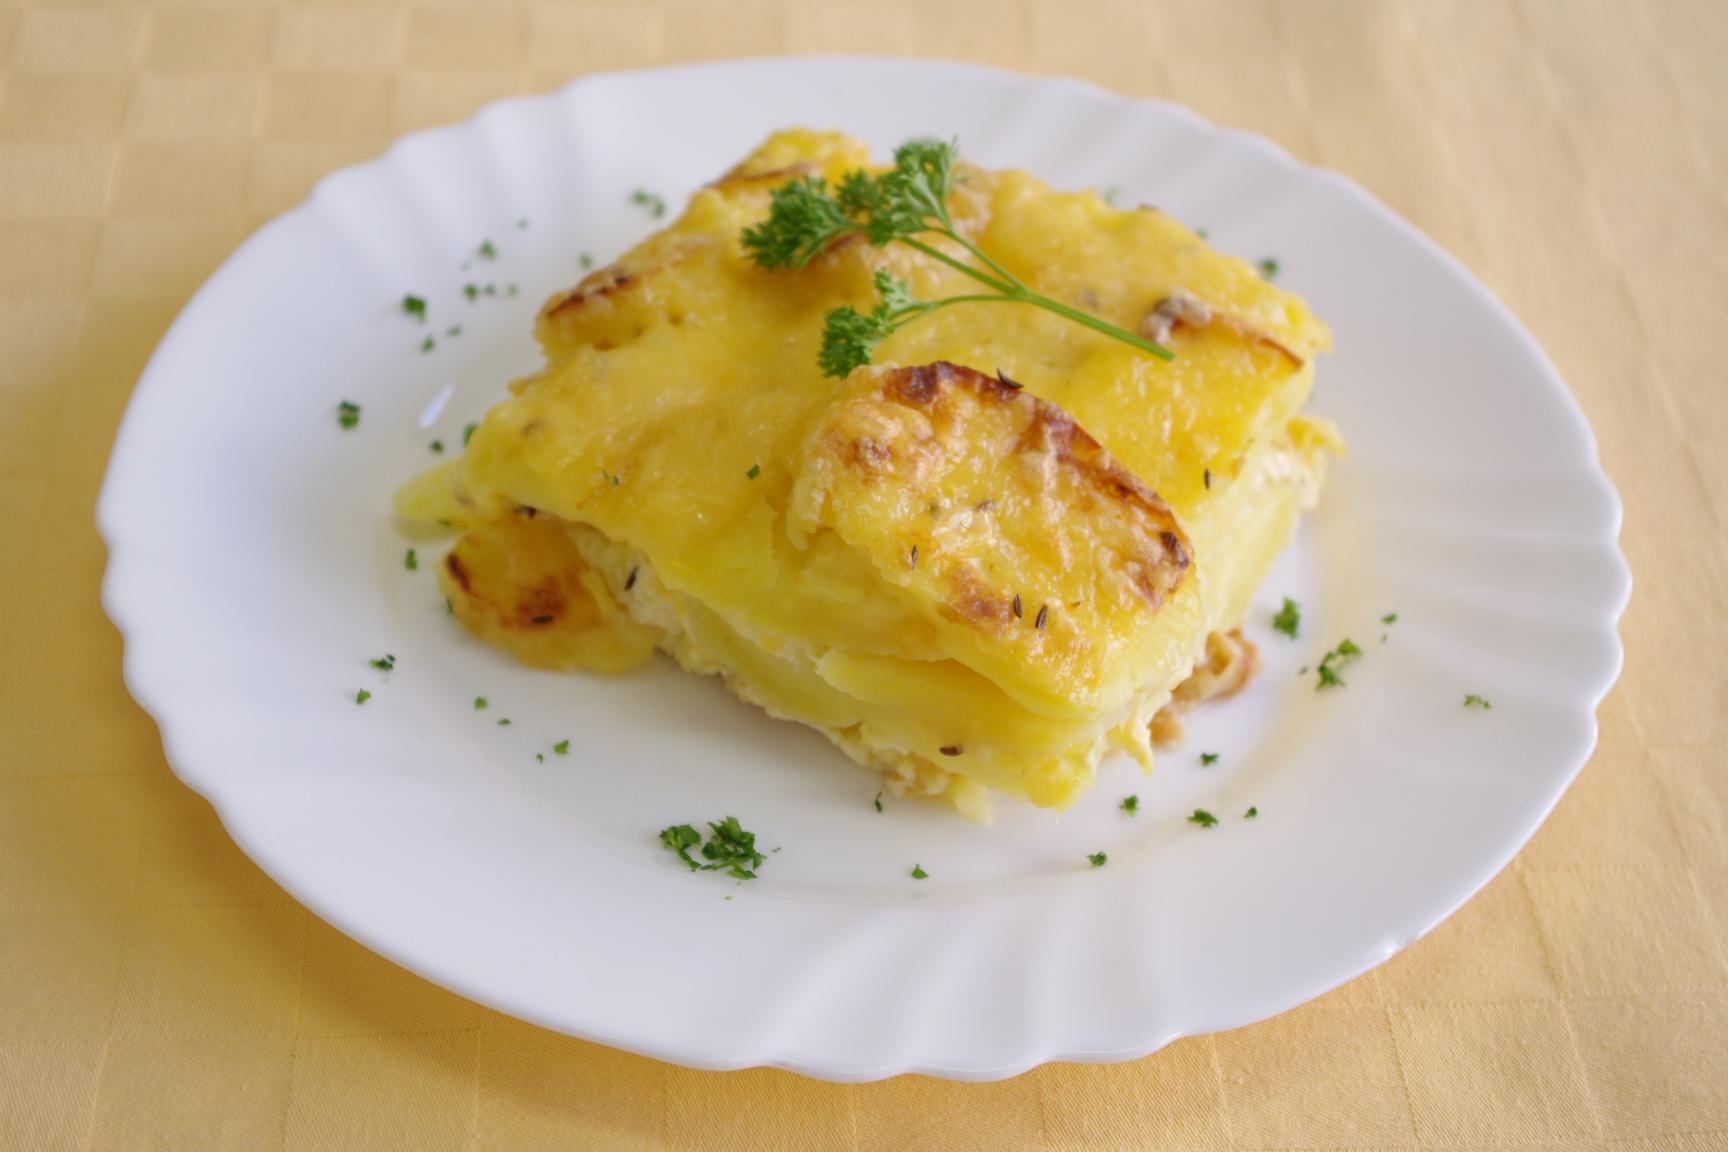 Zapekané zemiaky so syrom a vajcom